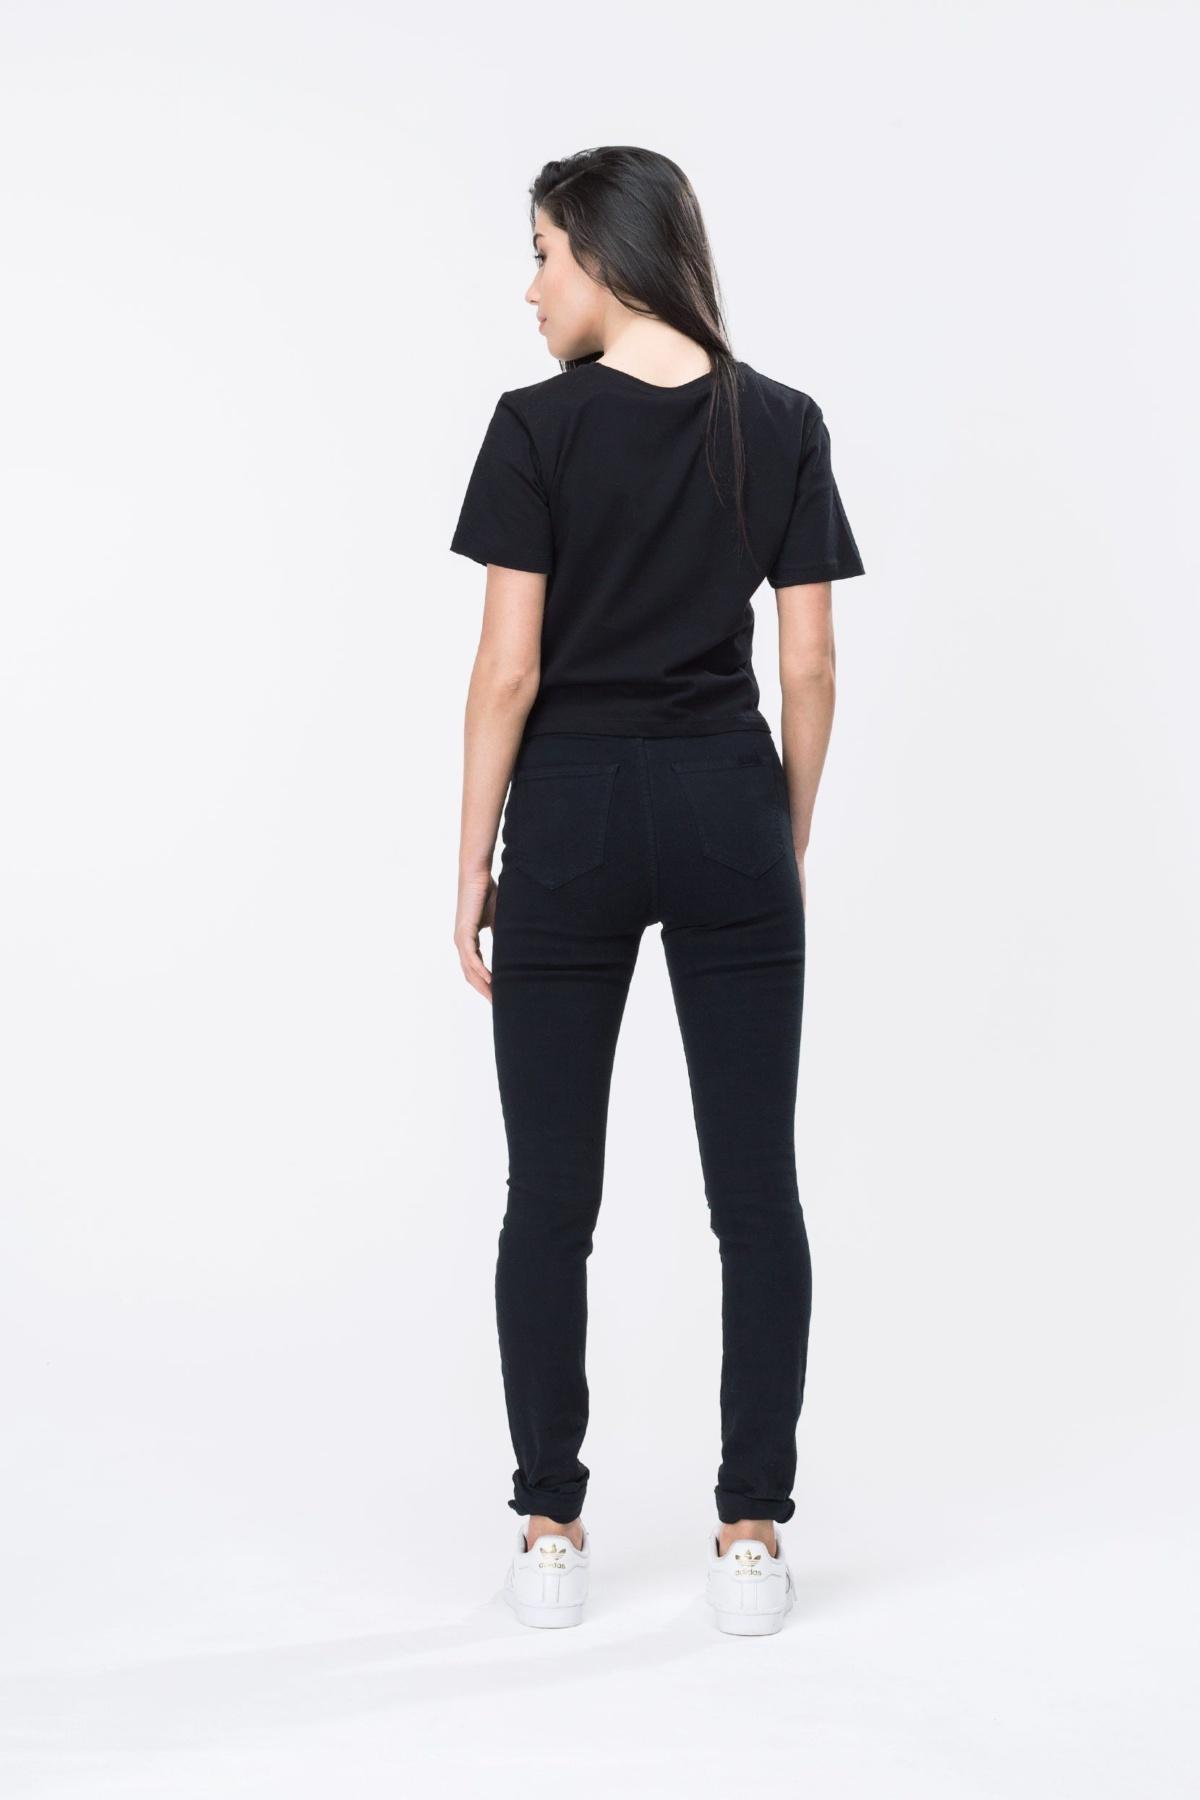 HYPE Black/White Hype Script Women's Crop T-Shirt